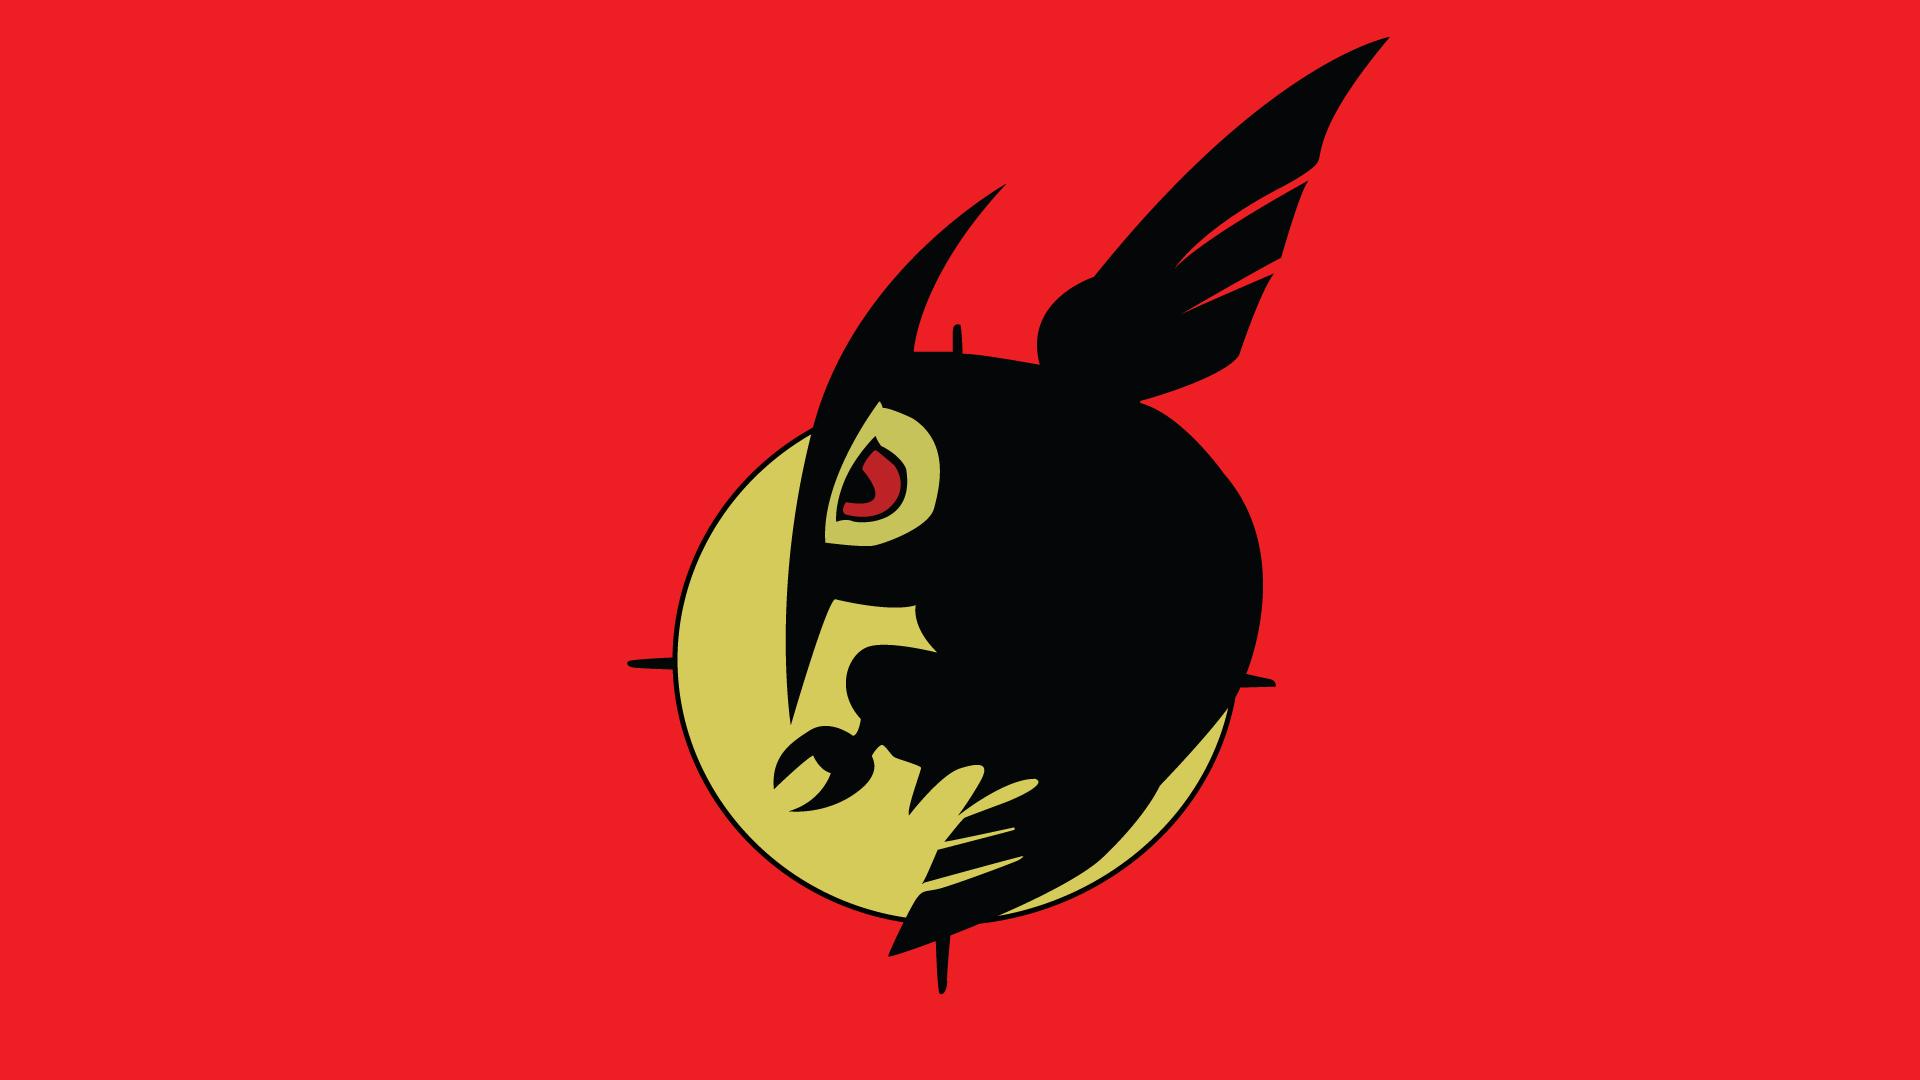 Night Wallpaper No Logo By Ualgreymon On Deviantart: Akame Ga Kill Night Raid Logo . By Atashinchiii On DeviantArt